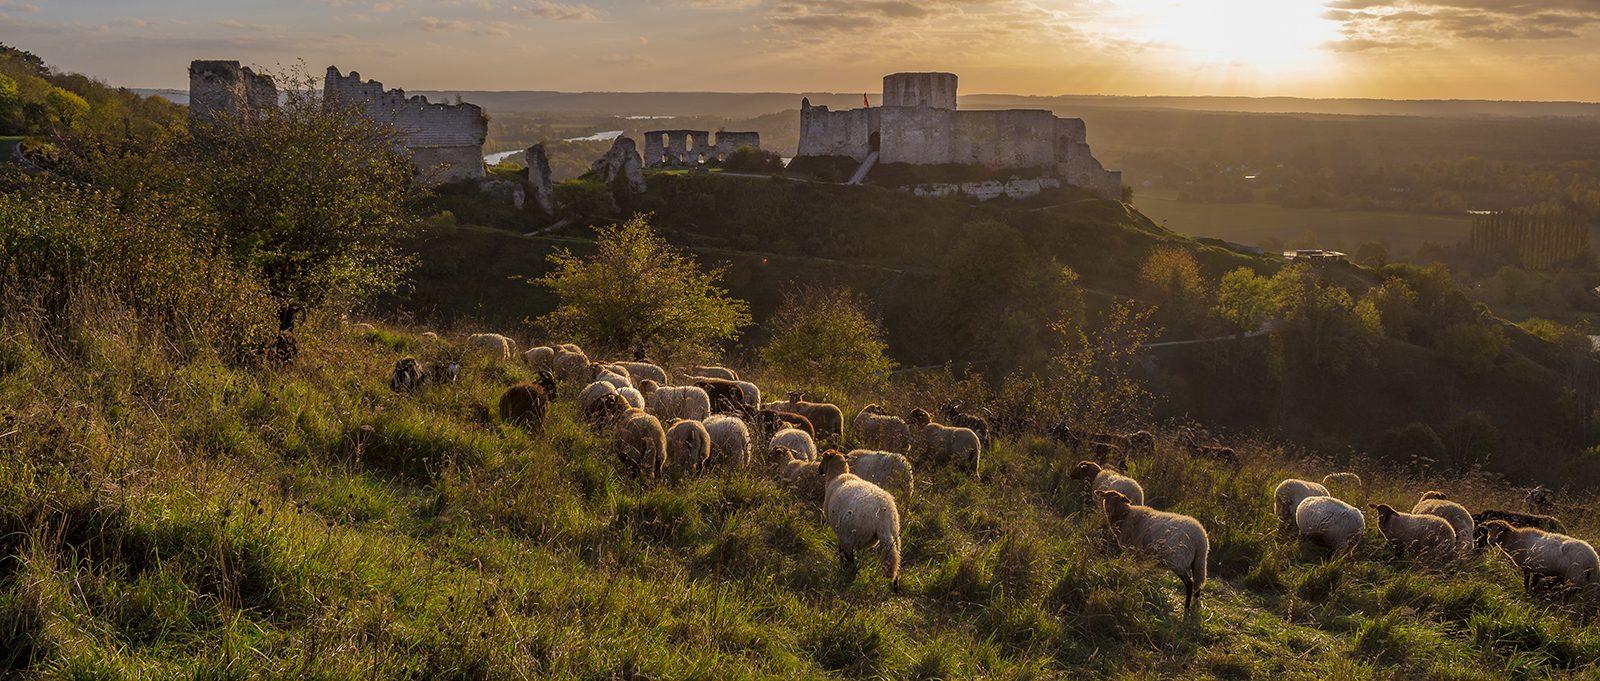 Les pâtures de Chateau-Gaillard - Les Andelys-©AquaCalypso